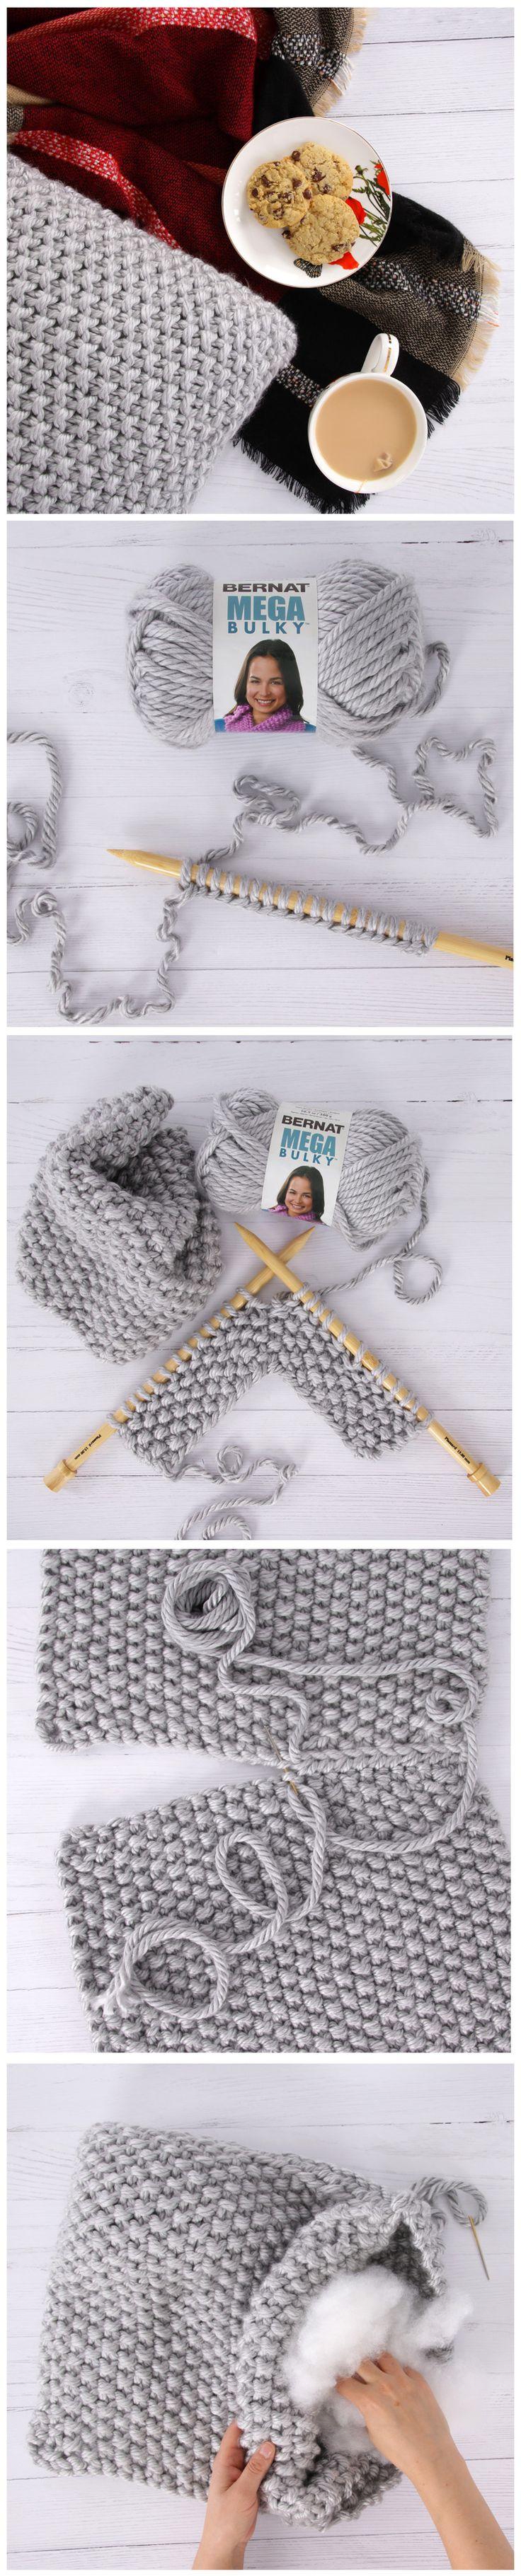 Coussin confort en tricot: Un tricot vite fait bien fait qu'il fait bon de serrer ! // Chunky Knit Pillow: Knitting up fast, this weekend project makes a thoughtful homemade gift.